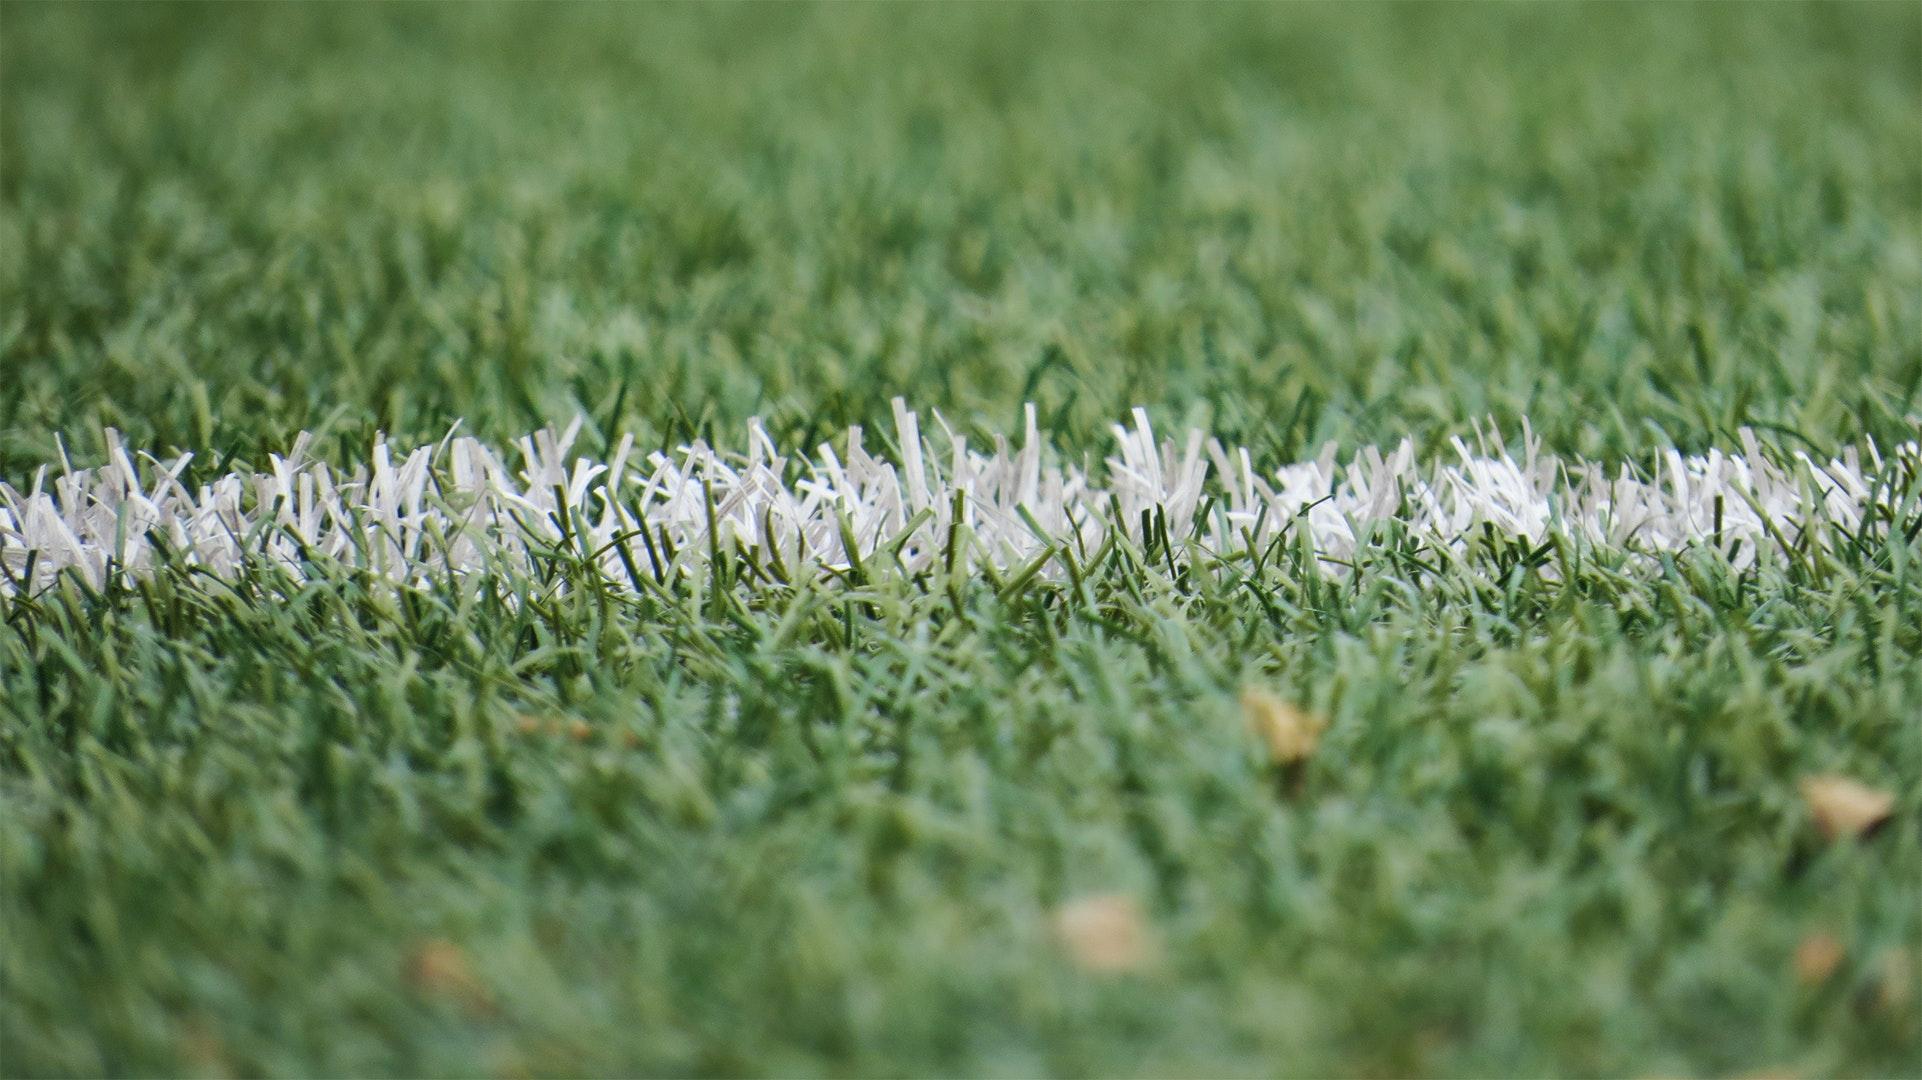 Fantasy Football Impact: Week 4 Steelers-Titans Game Rescheduled